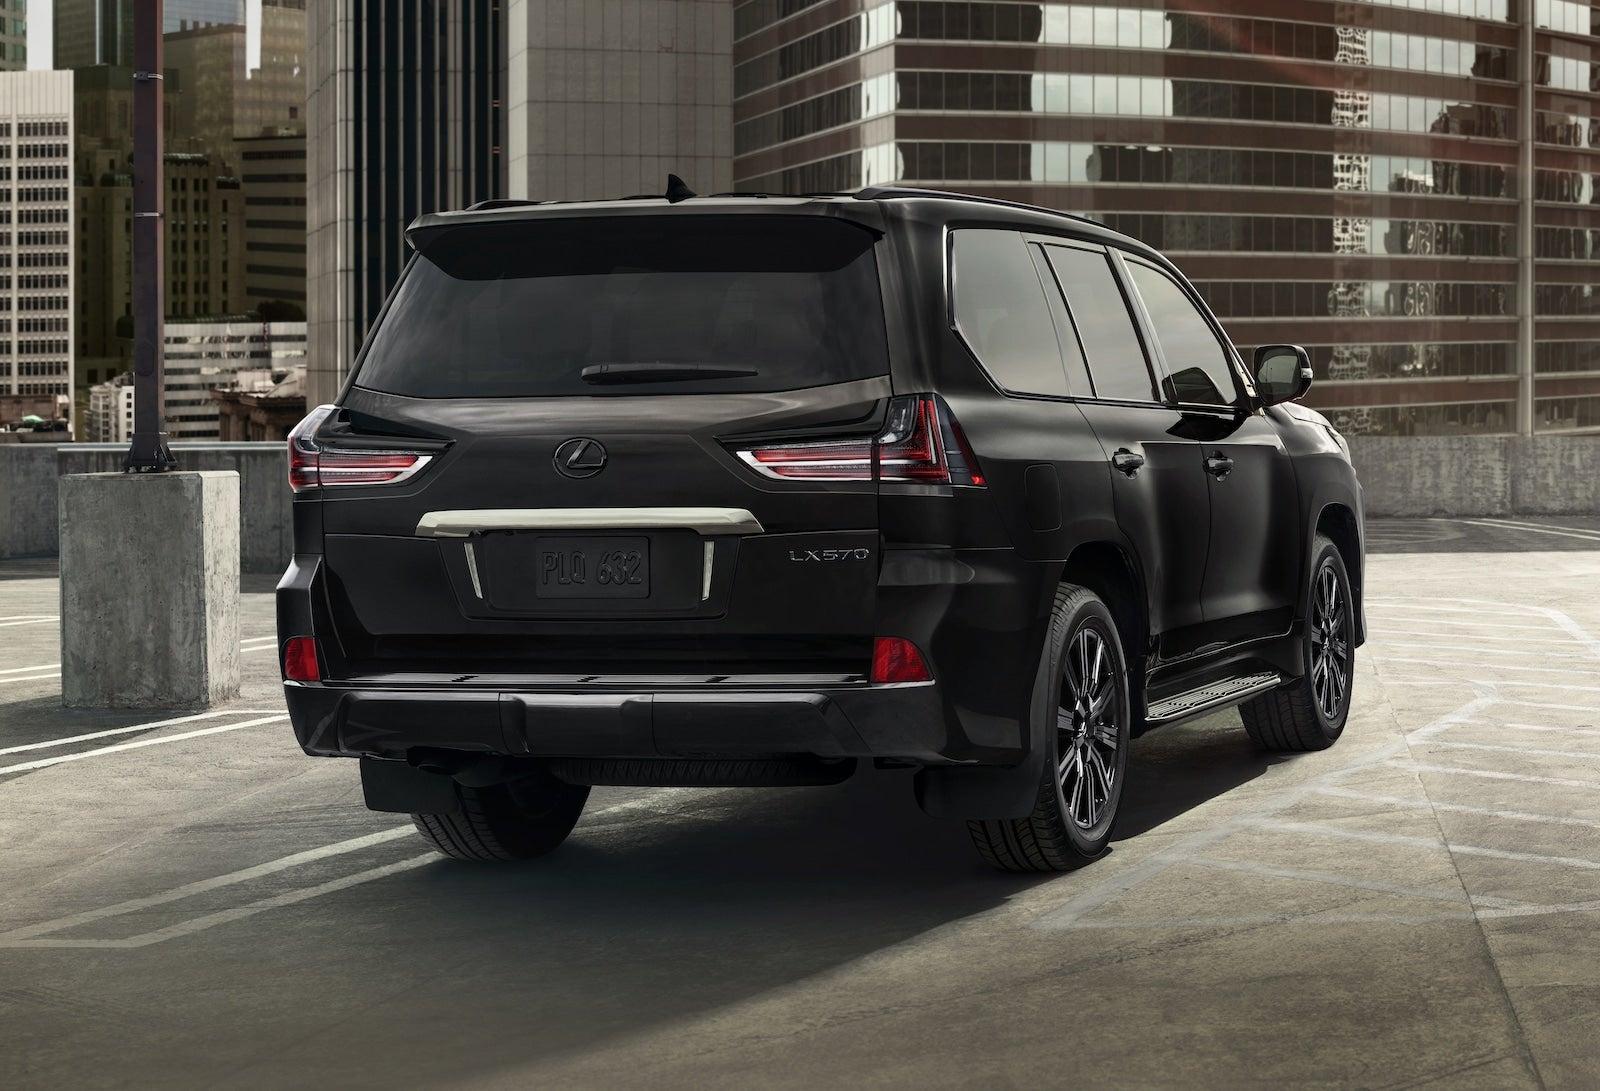 Lexus Upgrades The Lx 570 For 2021 Model Year The Detroit Bureau